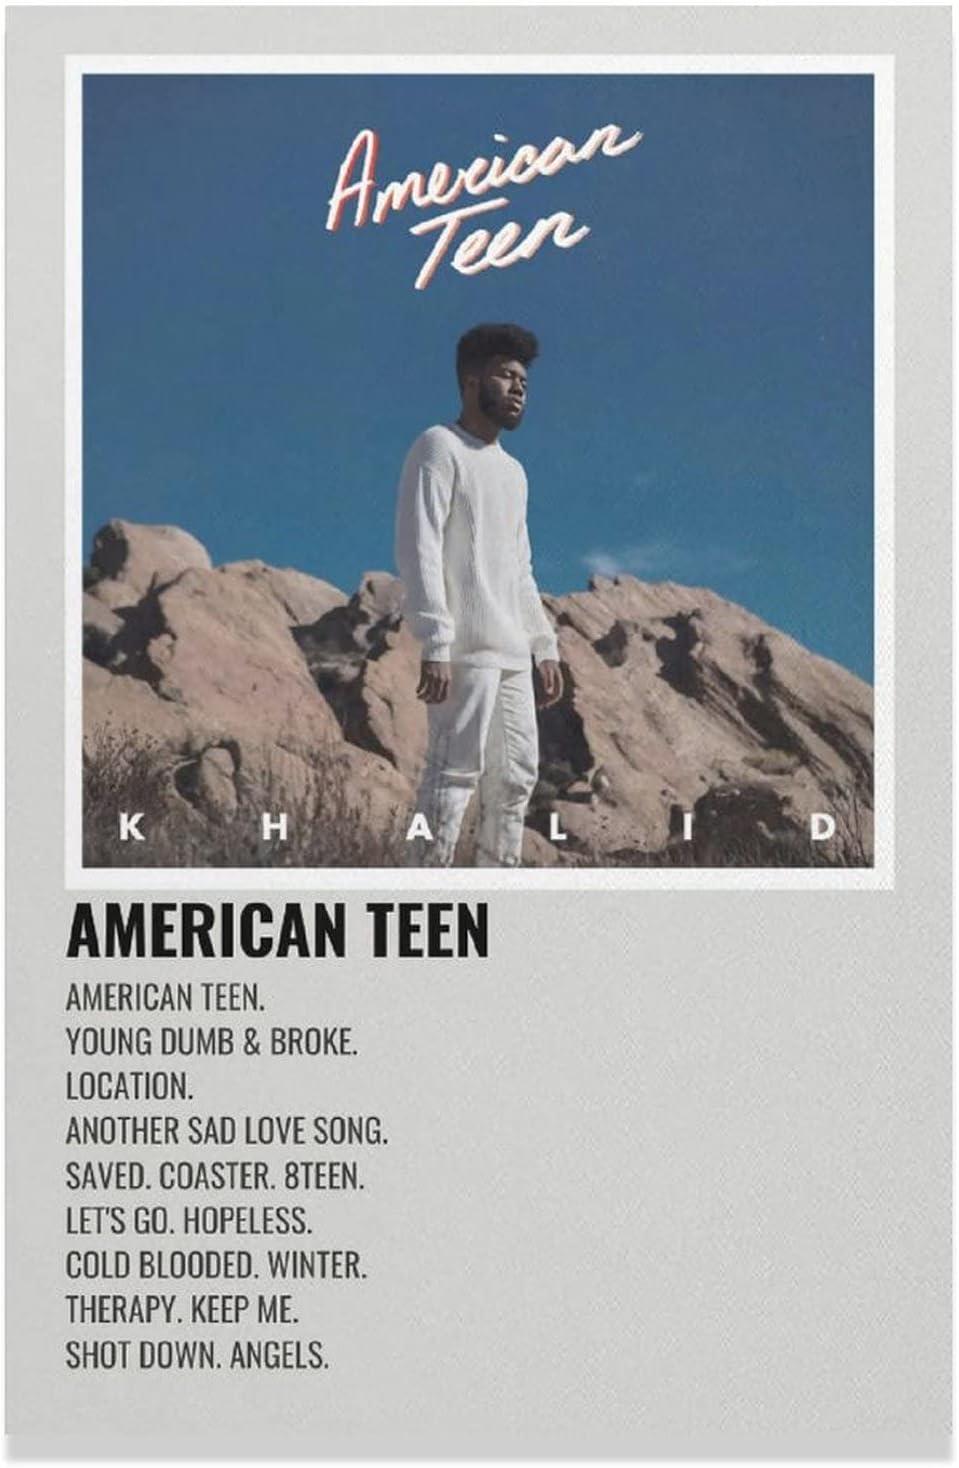 Singer American Teen Khalid R&B Teen Pop Canvas Poster Bedroom Decor Sports Landscape Office Room Decor Gift Unframe-style112×18inch(30×45cm)